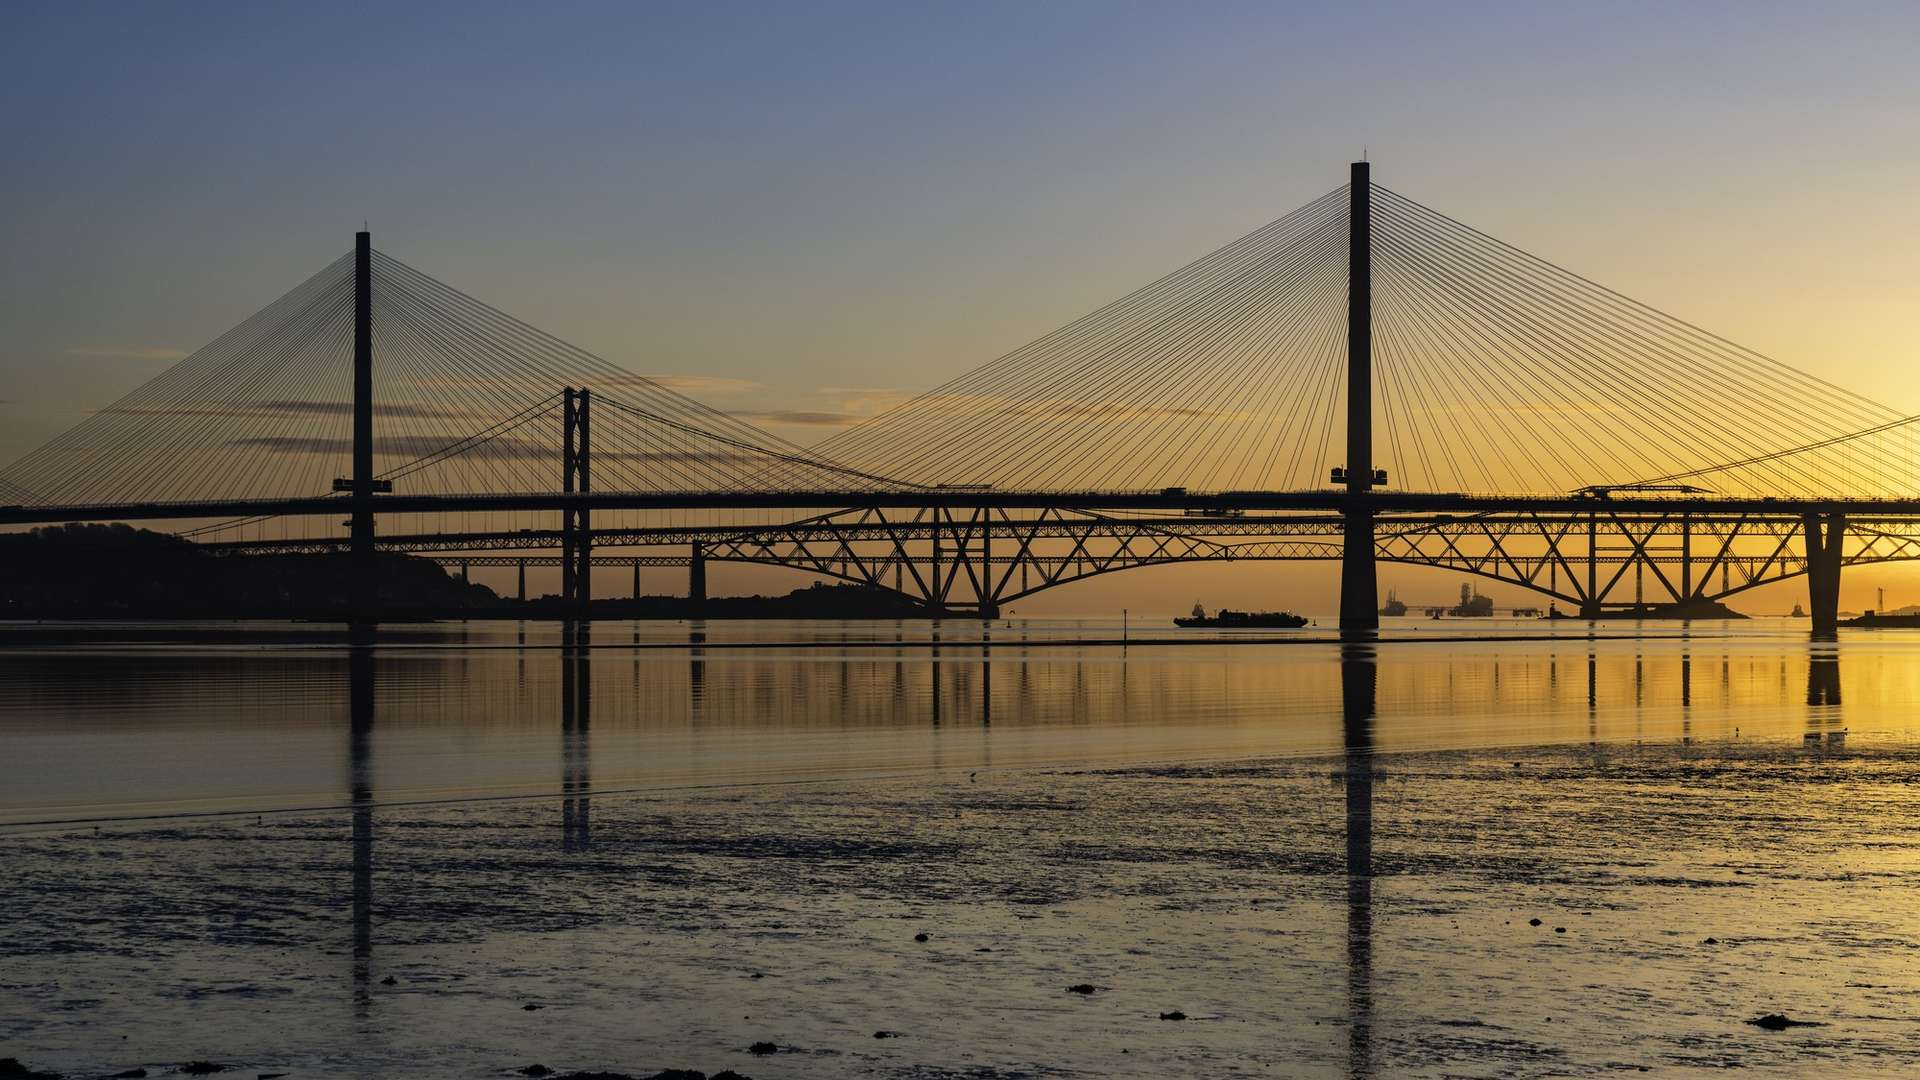 Bridge over a body of water